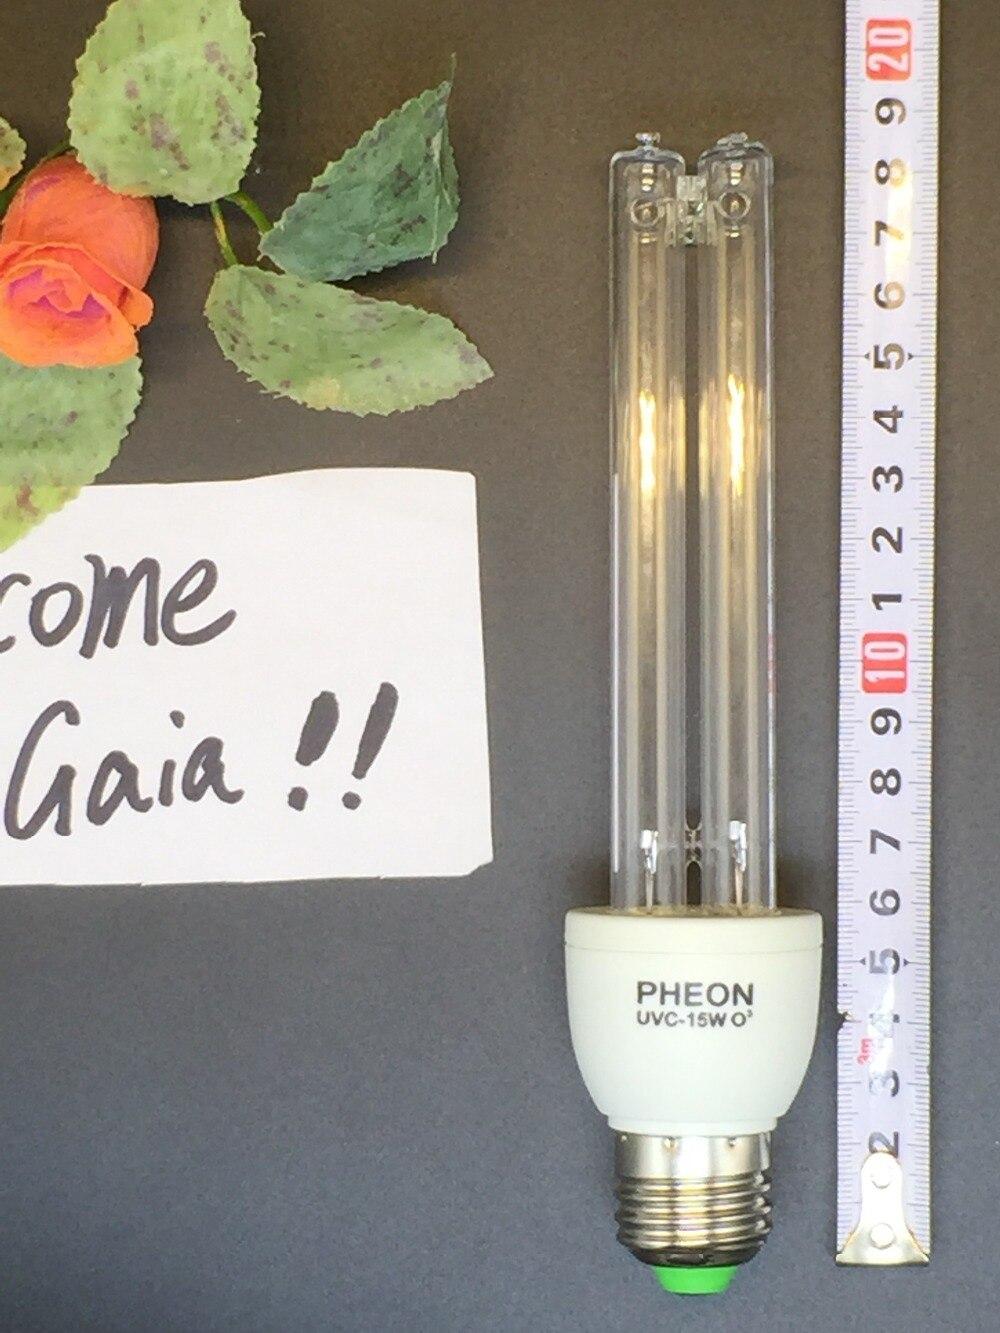 UVC + Ozone Germicidal Deodorant Compact Fluorescent Light 220V 15W E27 Screw Base, UV CFL Sterilization Light.